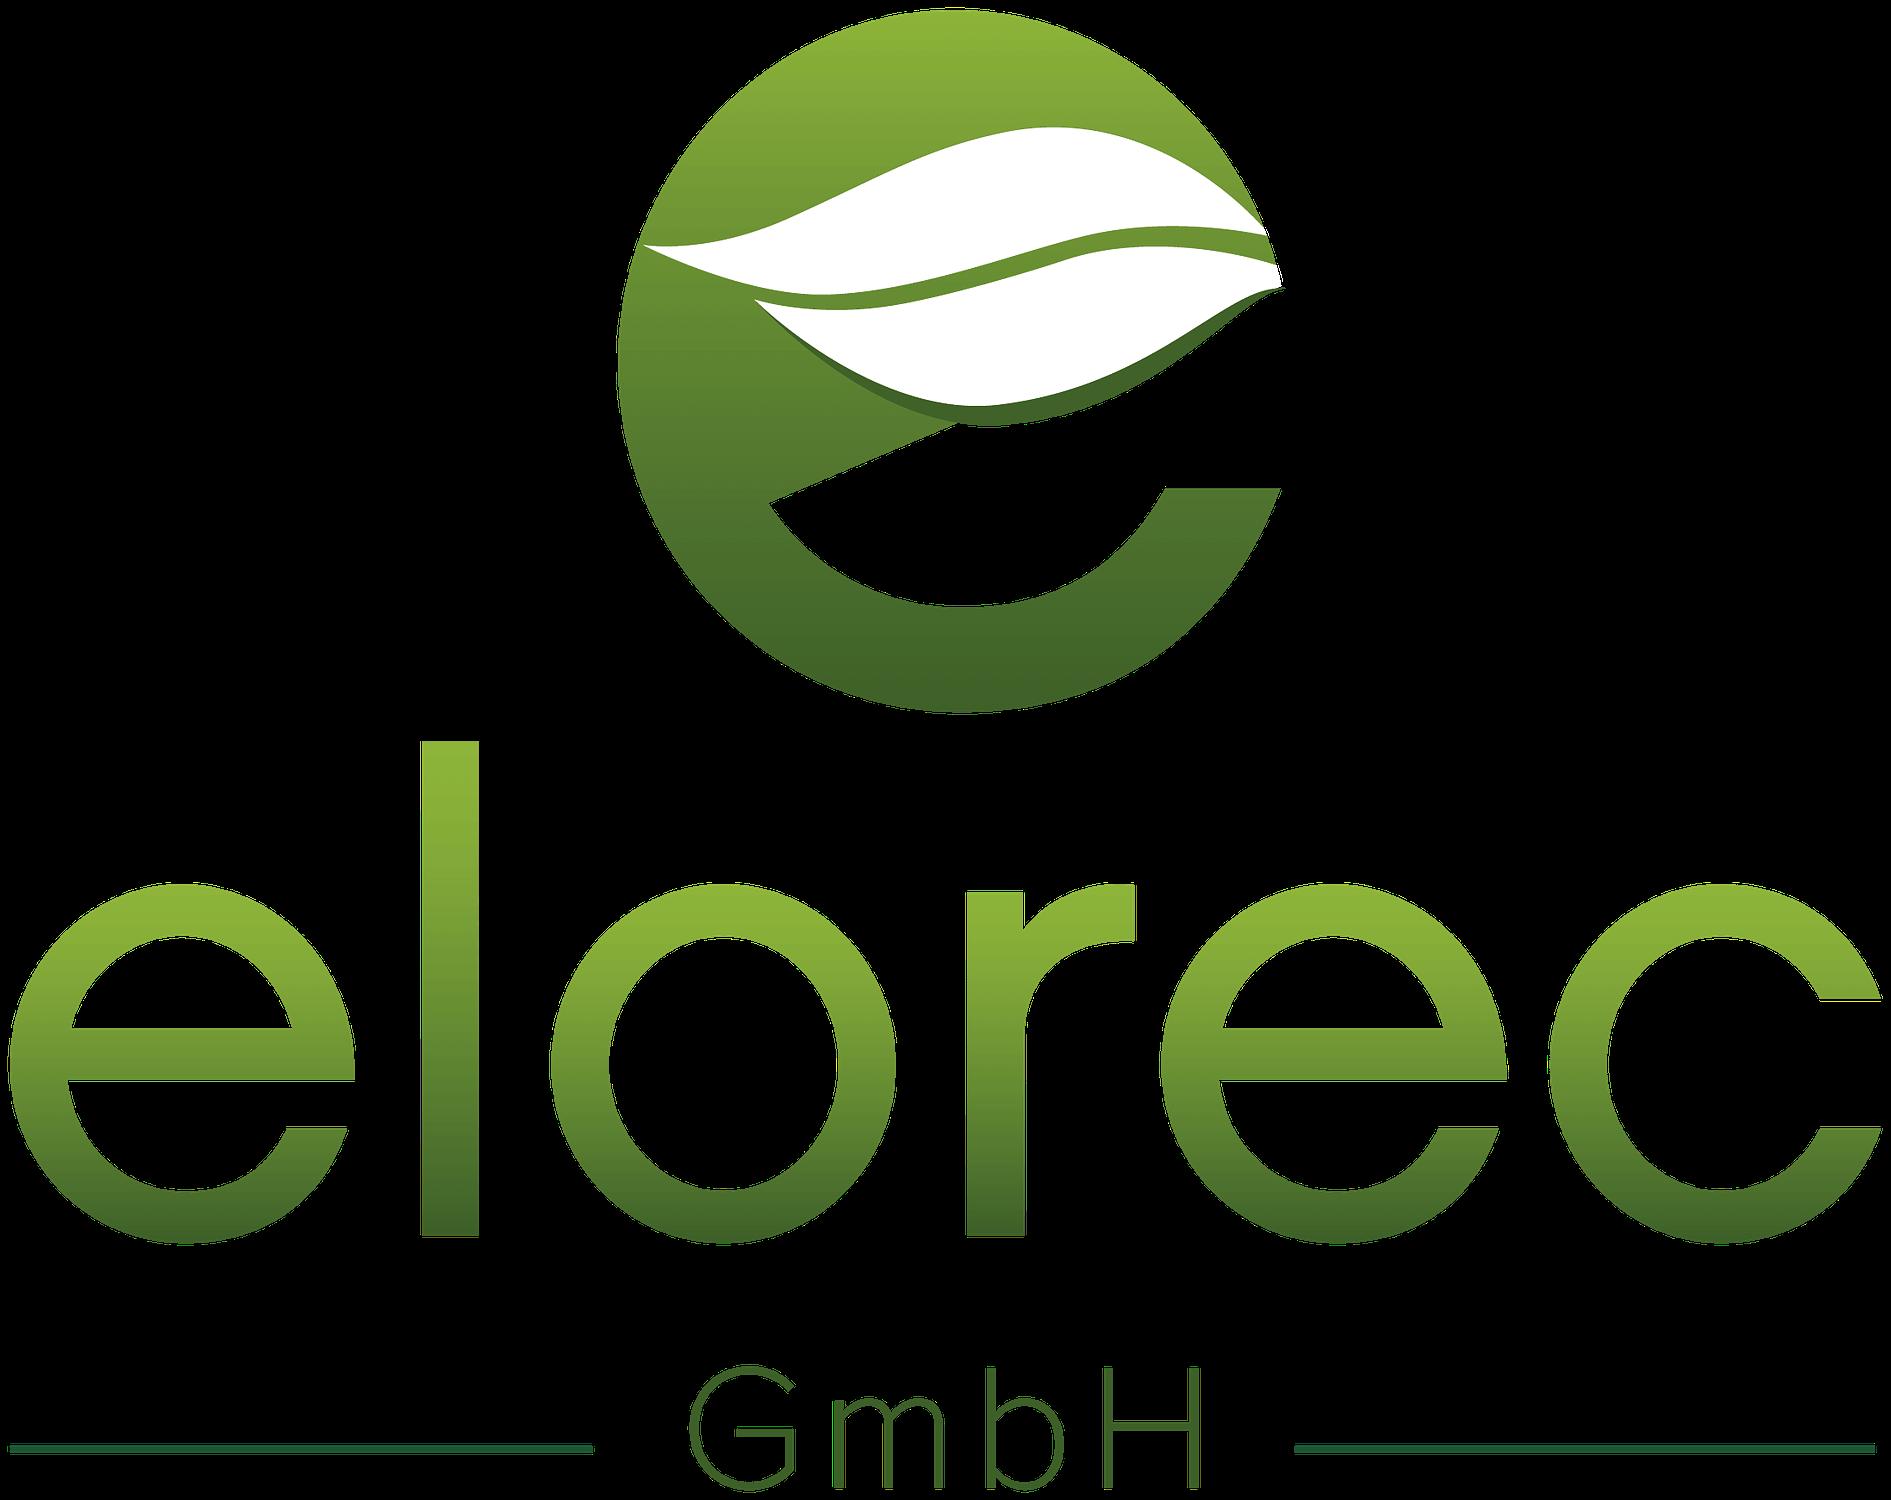 elorec GmbH Logo transparent